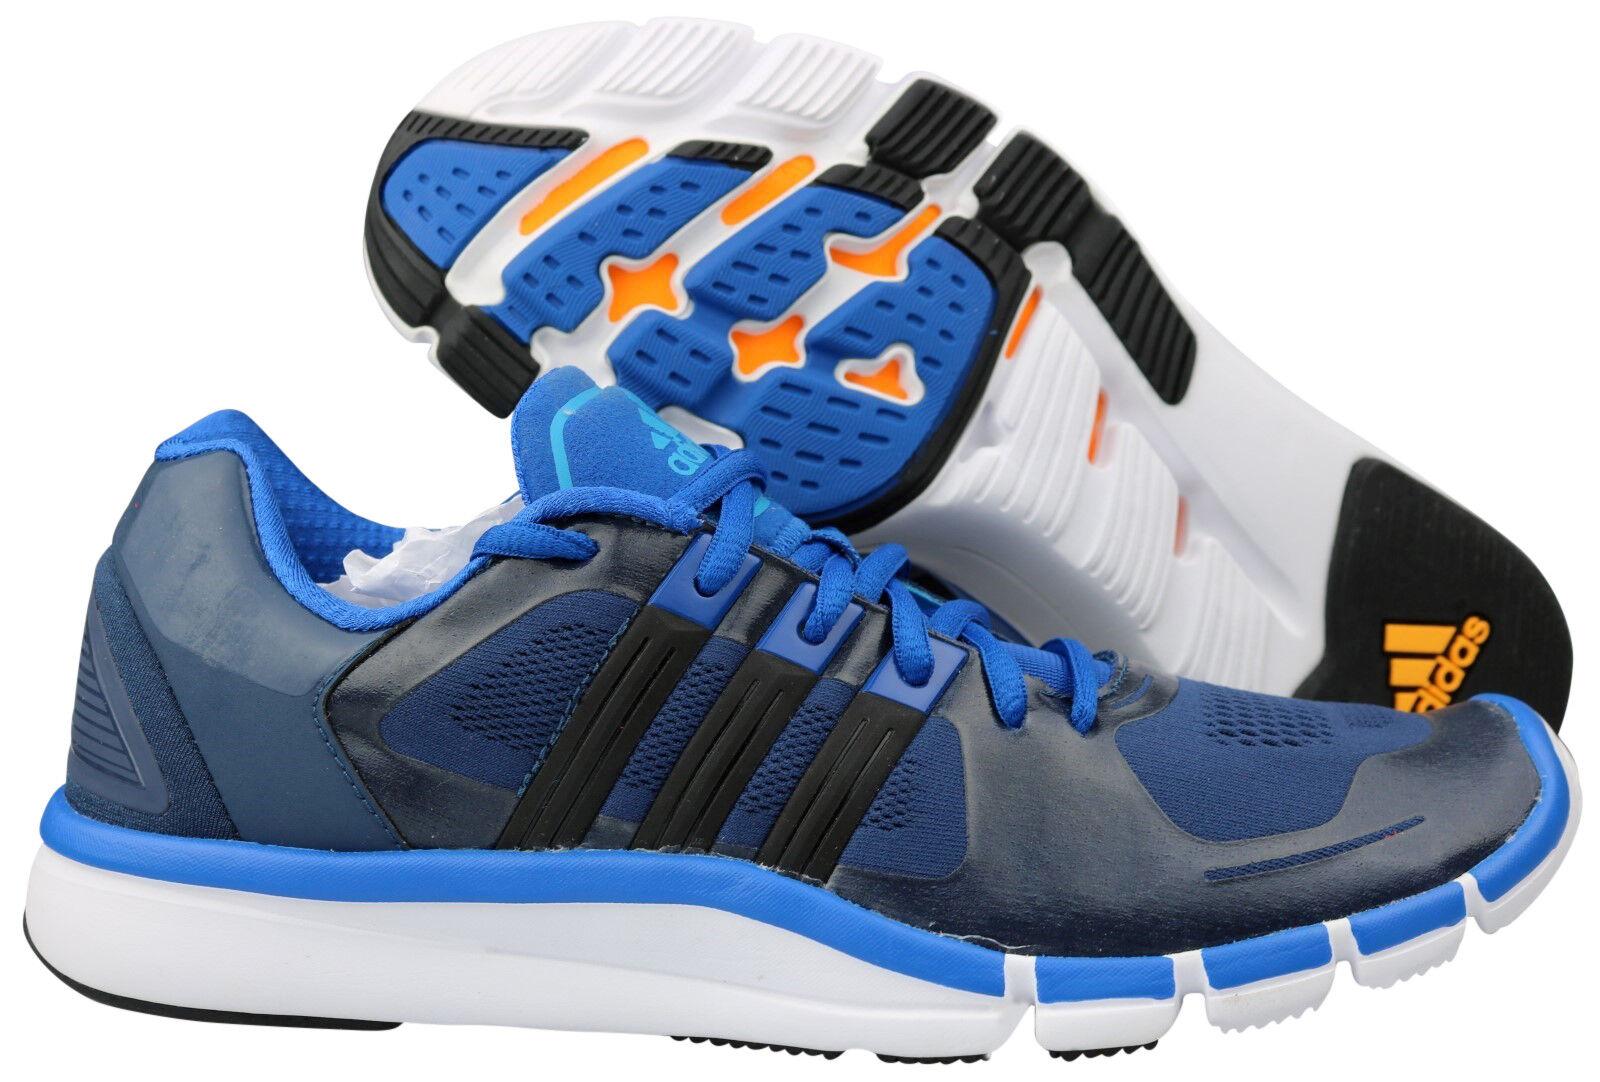 Adidas Adipure 360.2 M Herren Laufschuhe 43 Gr Schuhe M18102 blau Gr 43 39 ... 0f4d80